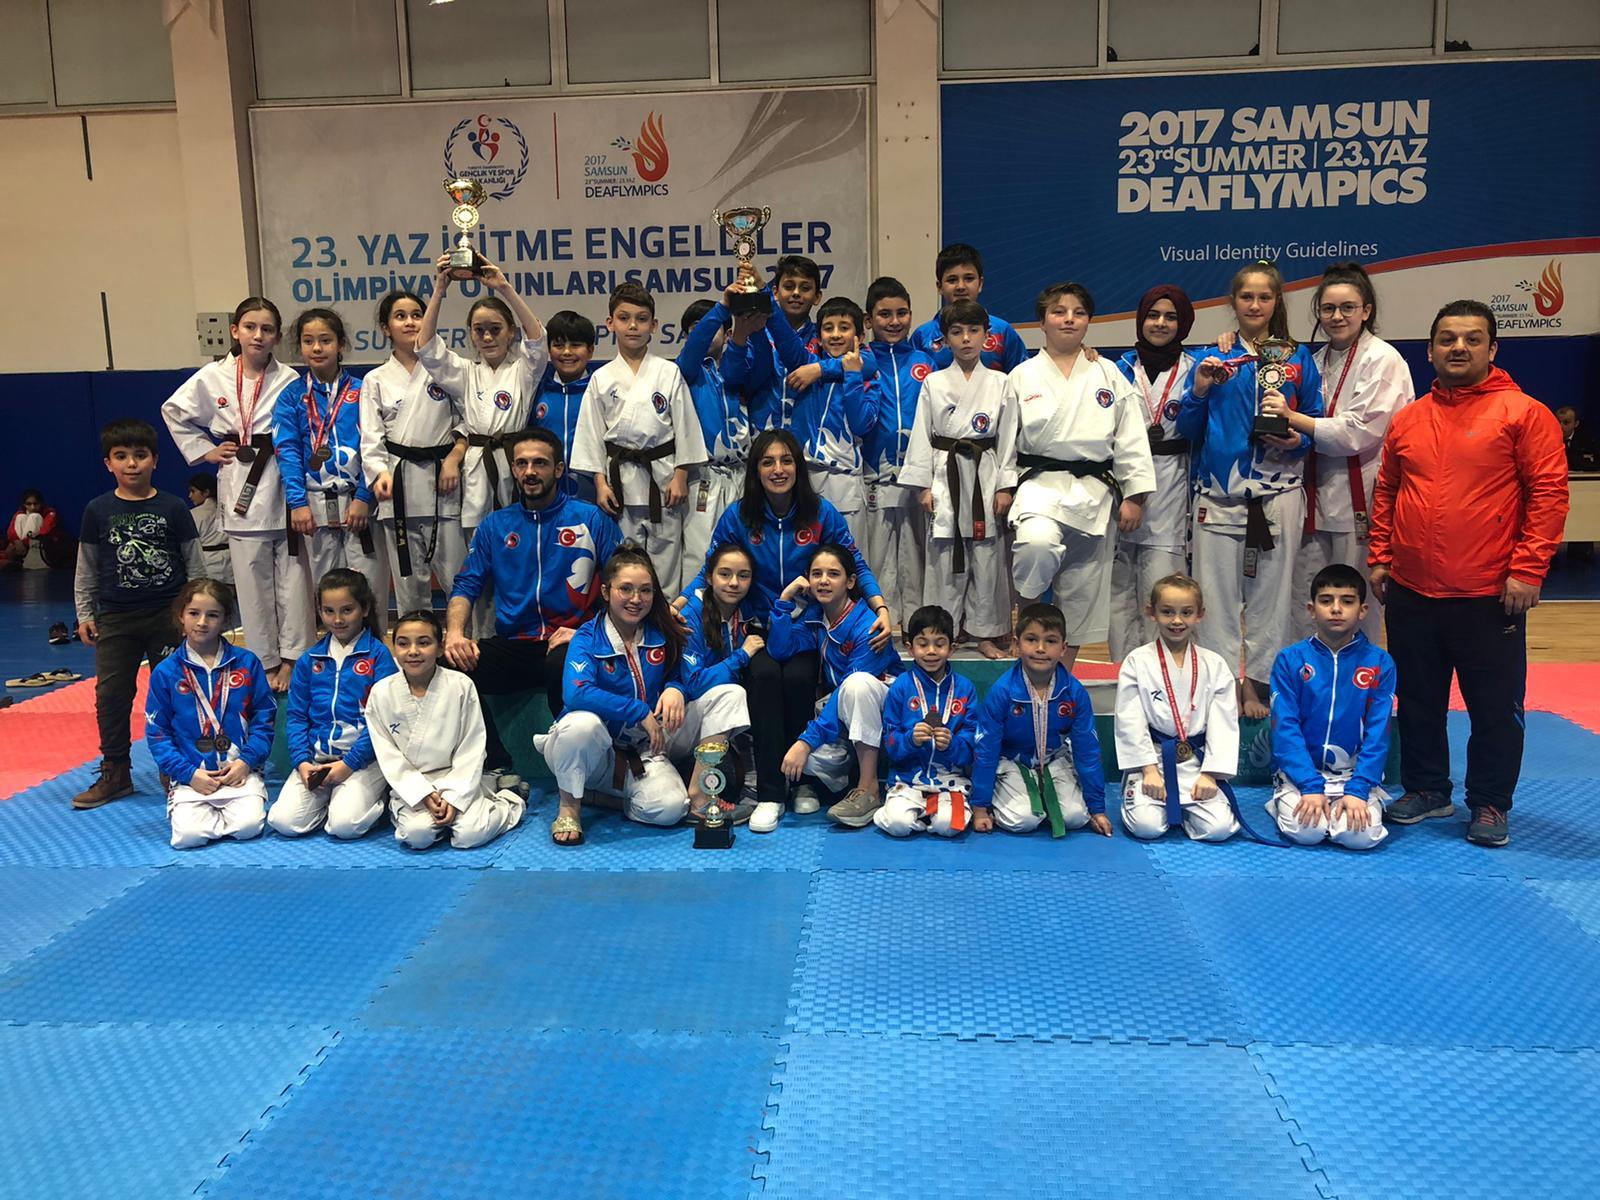 Akademi karatecileri yine